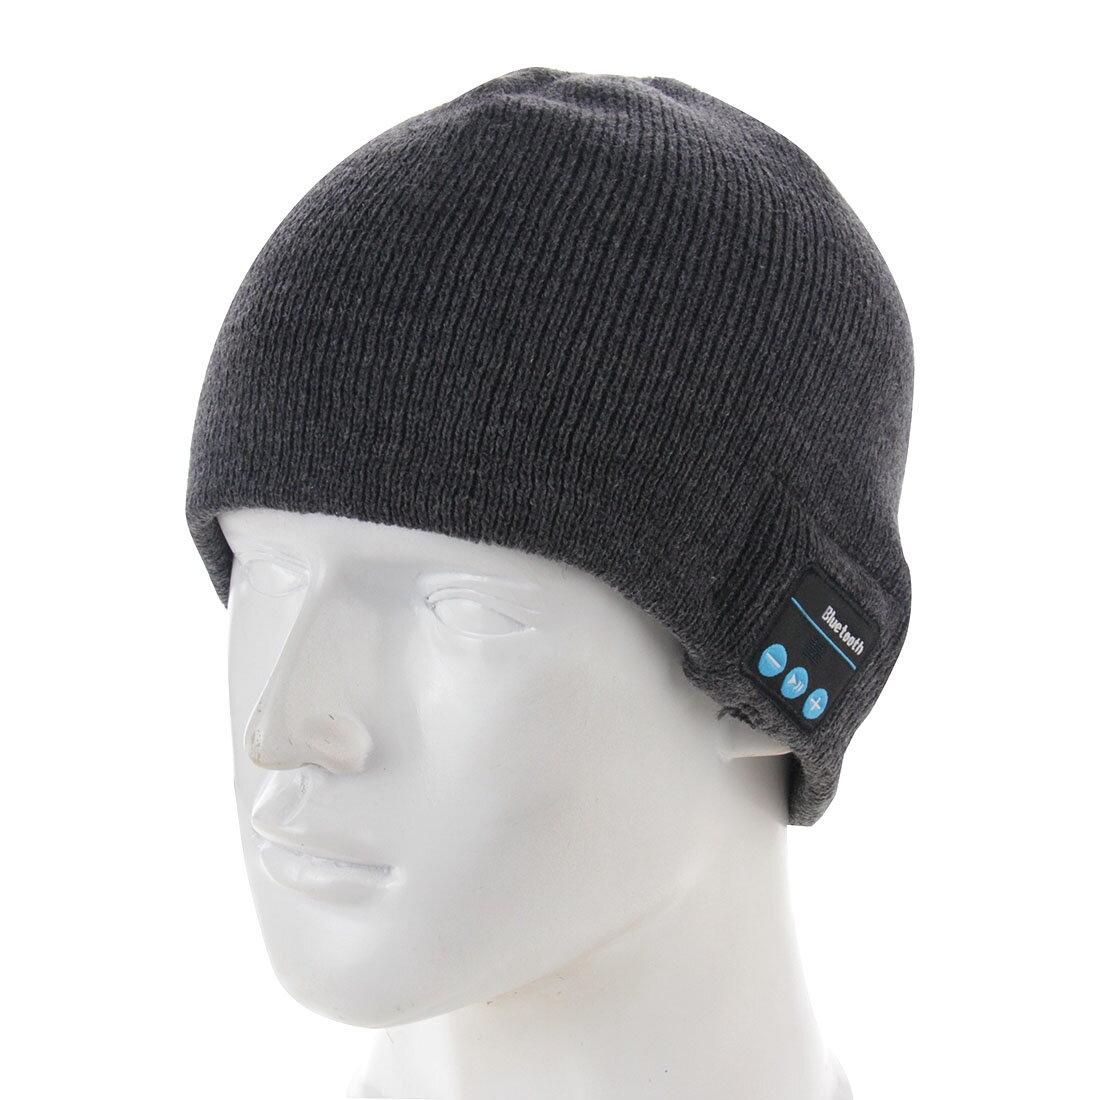 3abccf8fcdd Generic Bluetooth Headset